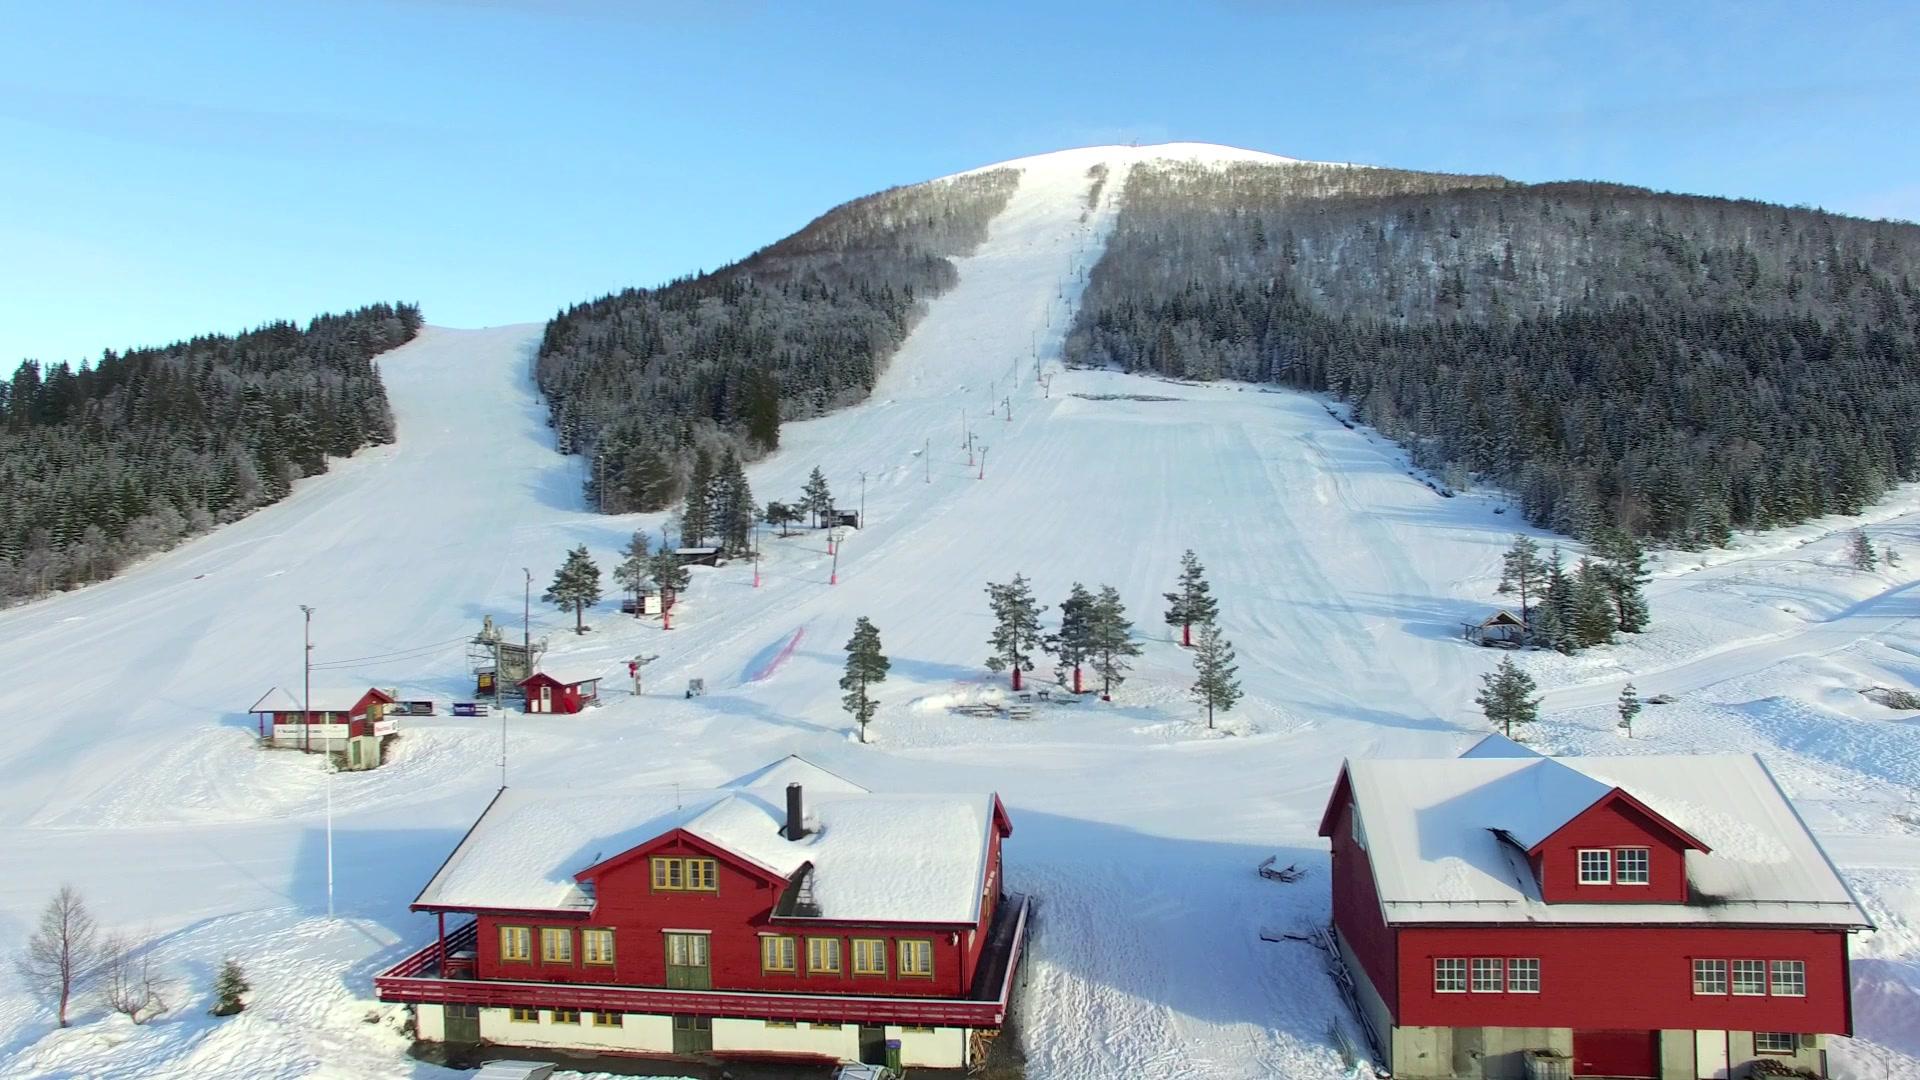 Volda skisenter påska 2016: Nydeleg påskeføre i skiløypene